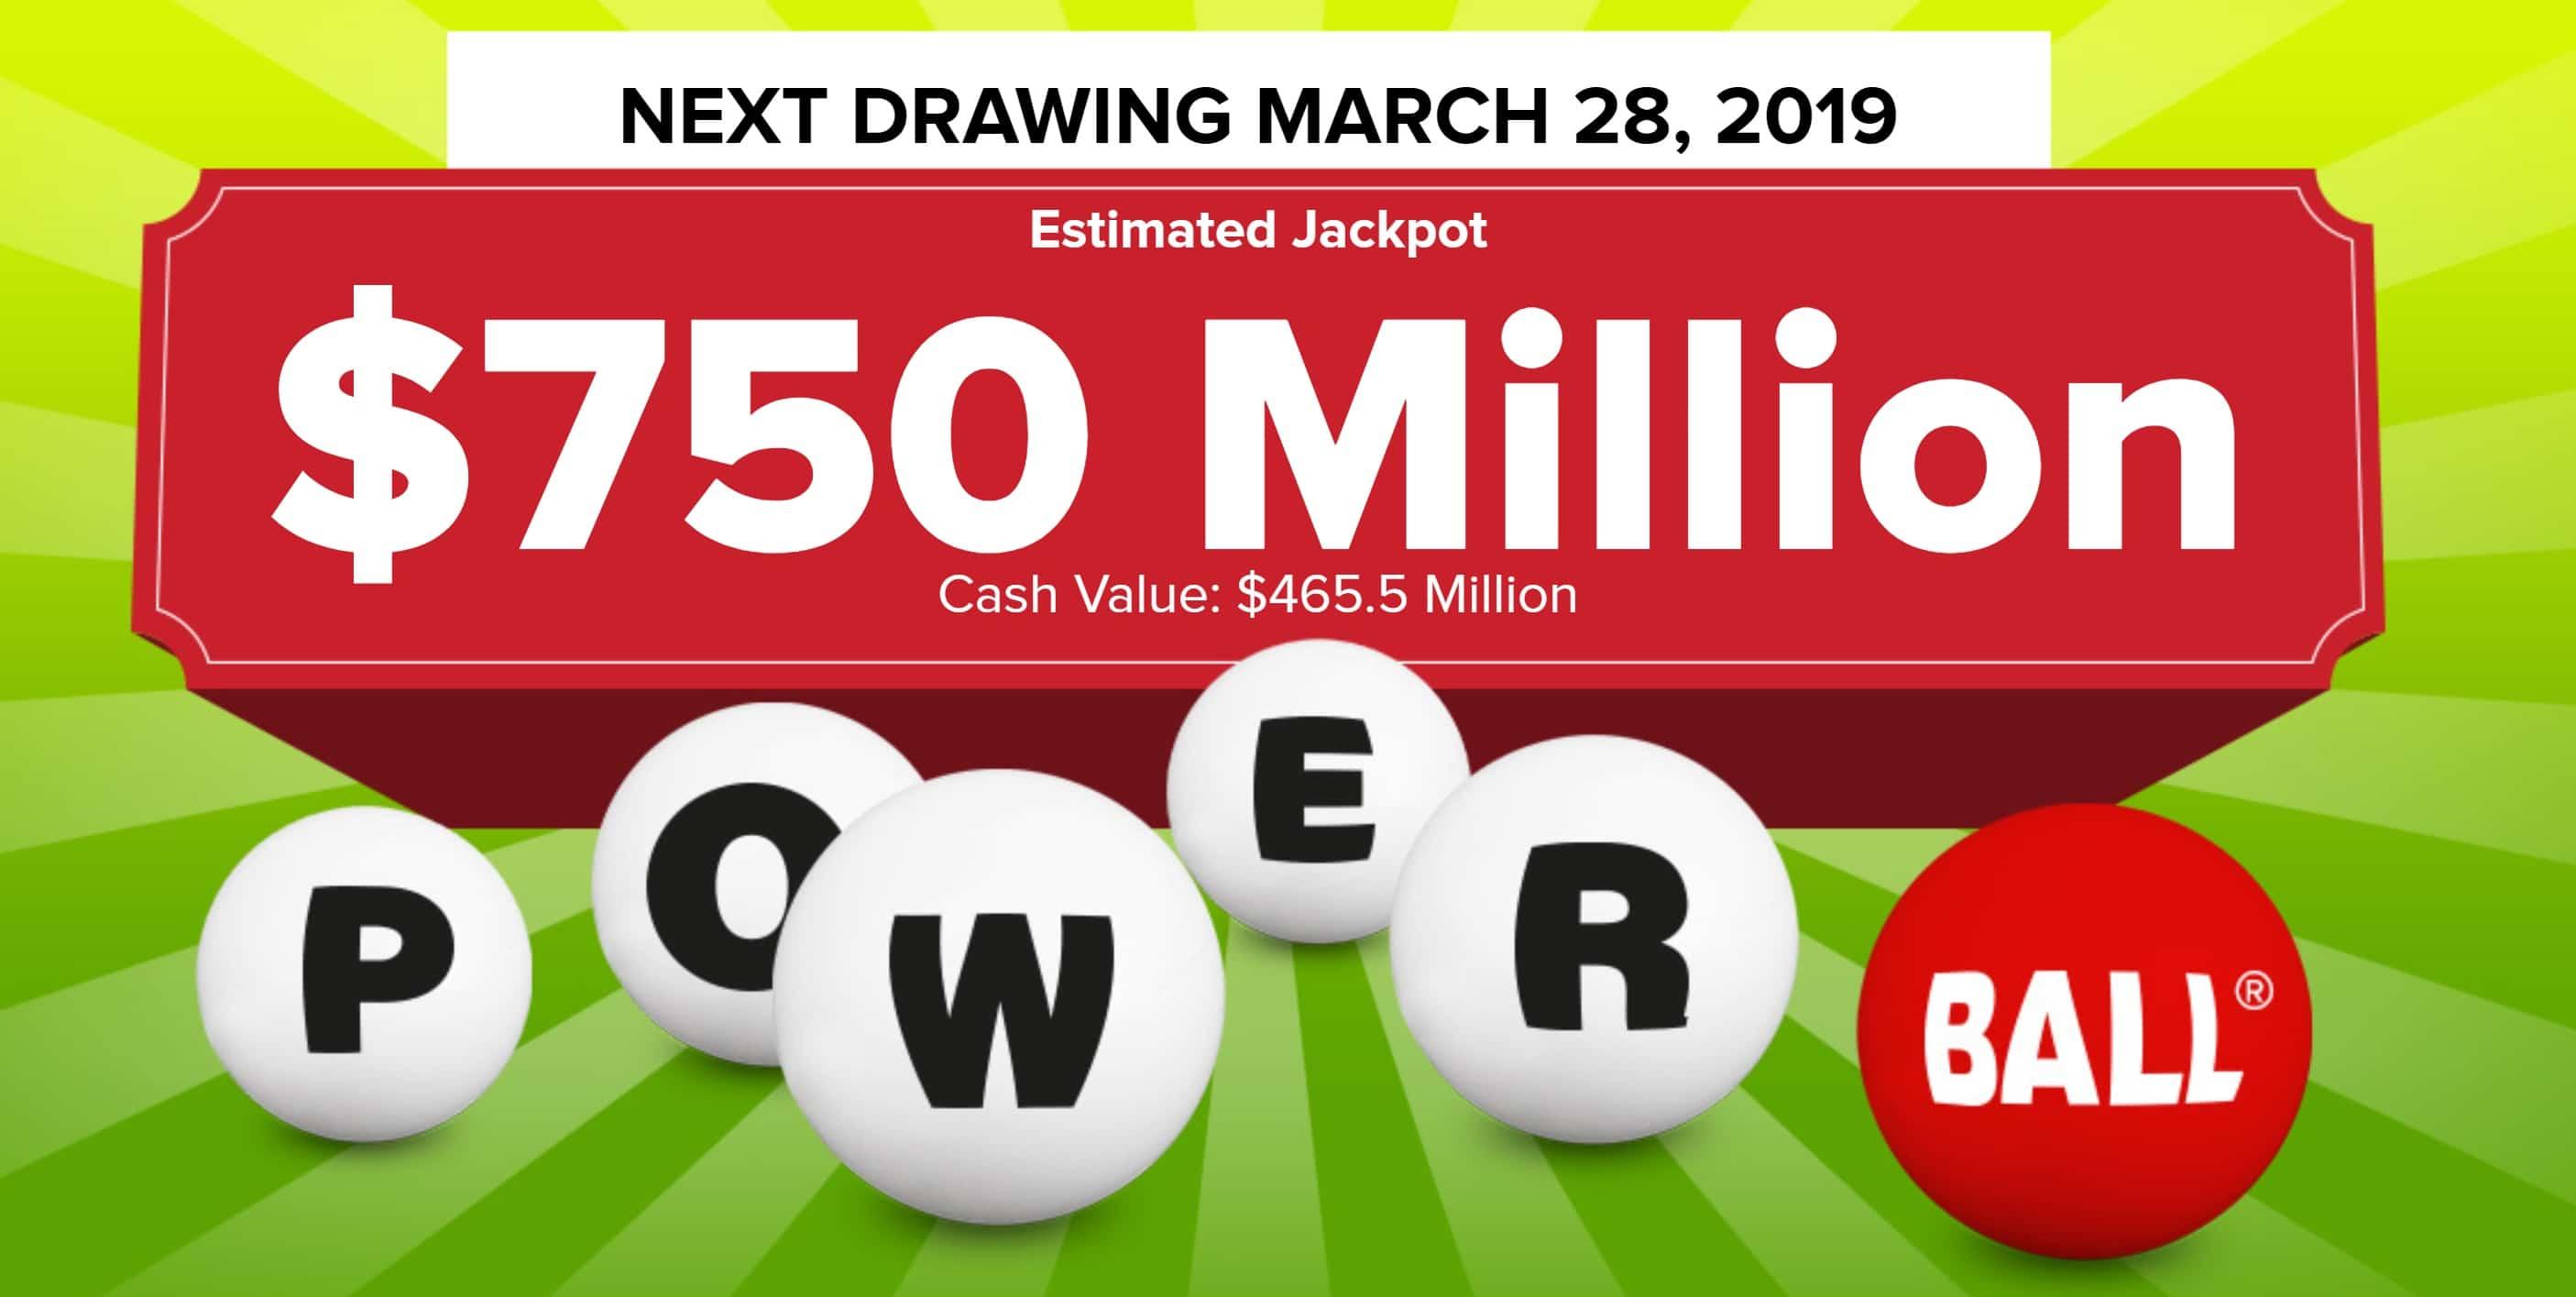 annonce powerball de 750 millions de dollars ce mercredi 27 mars 2019